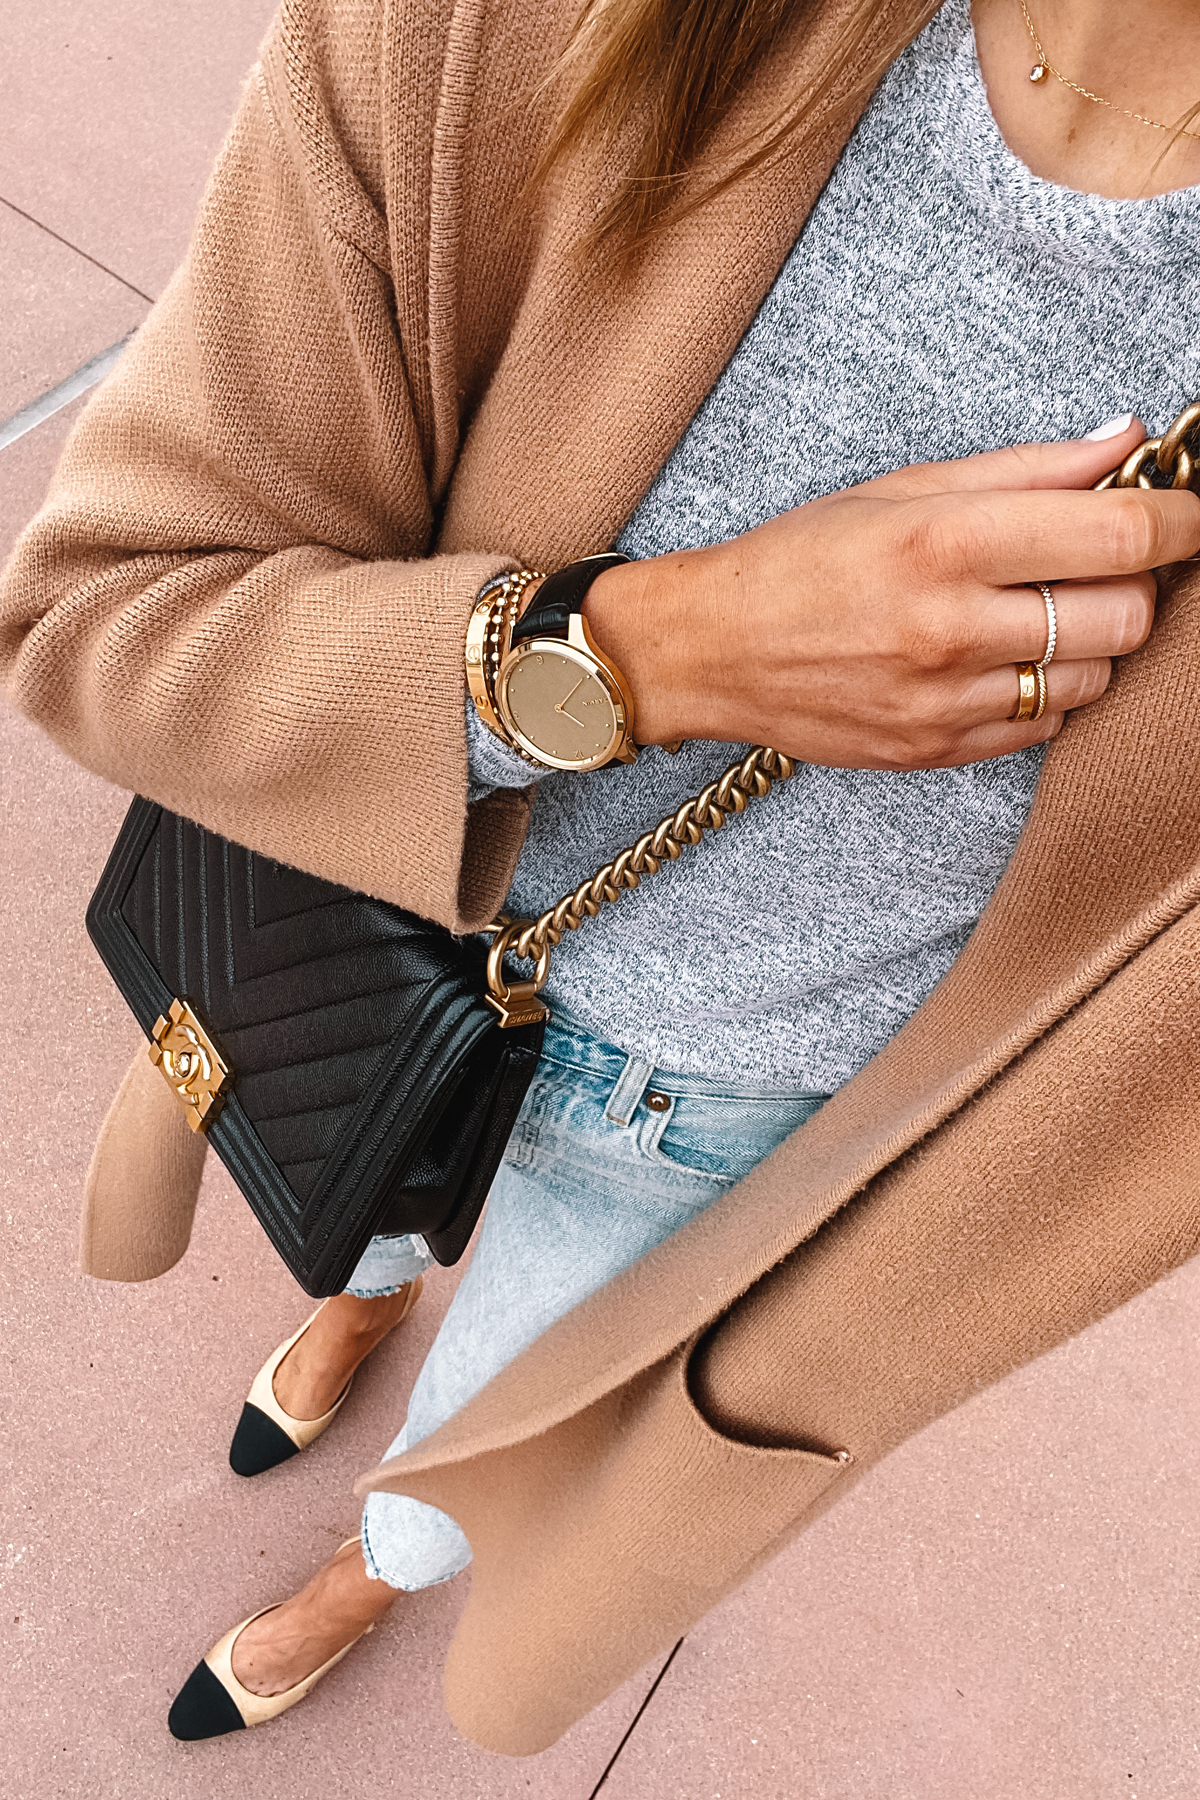 Fashion Jackson Wearing Tan Coatigan Grey T-shirt Light Wash Jeans Chanel Slingbacks Chanel Black Boy Bag Garmin Vivomove Luxe Watch Gold